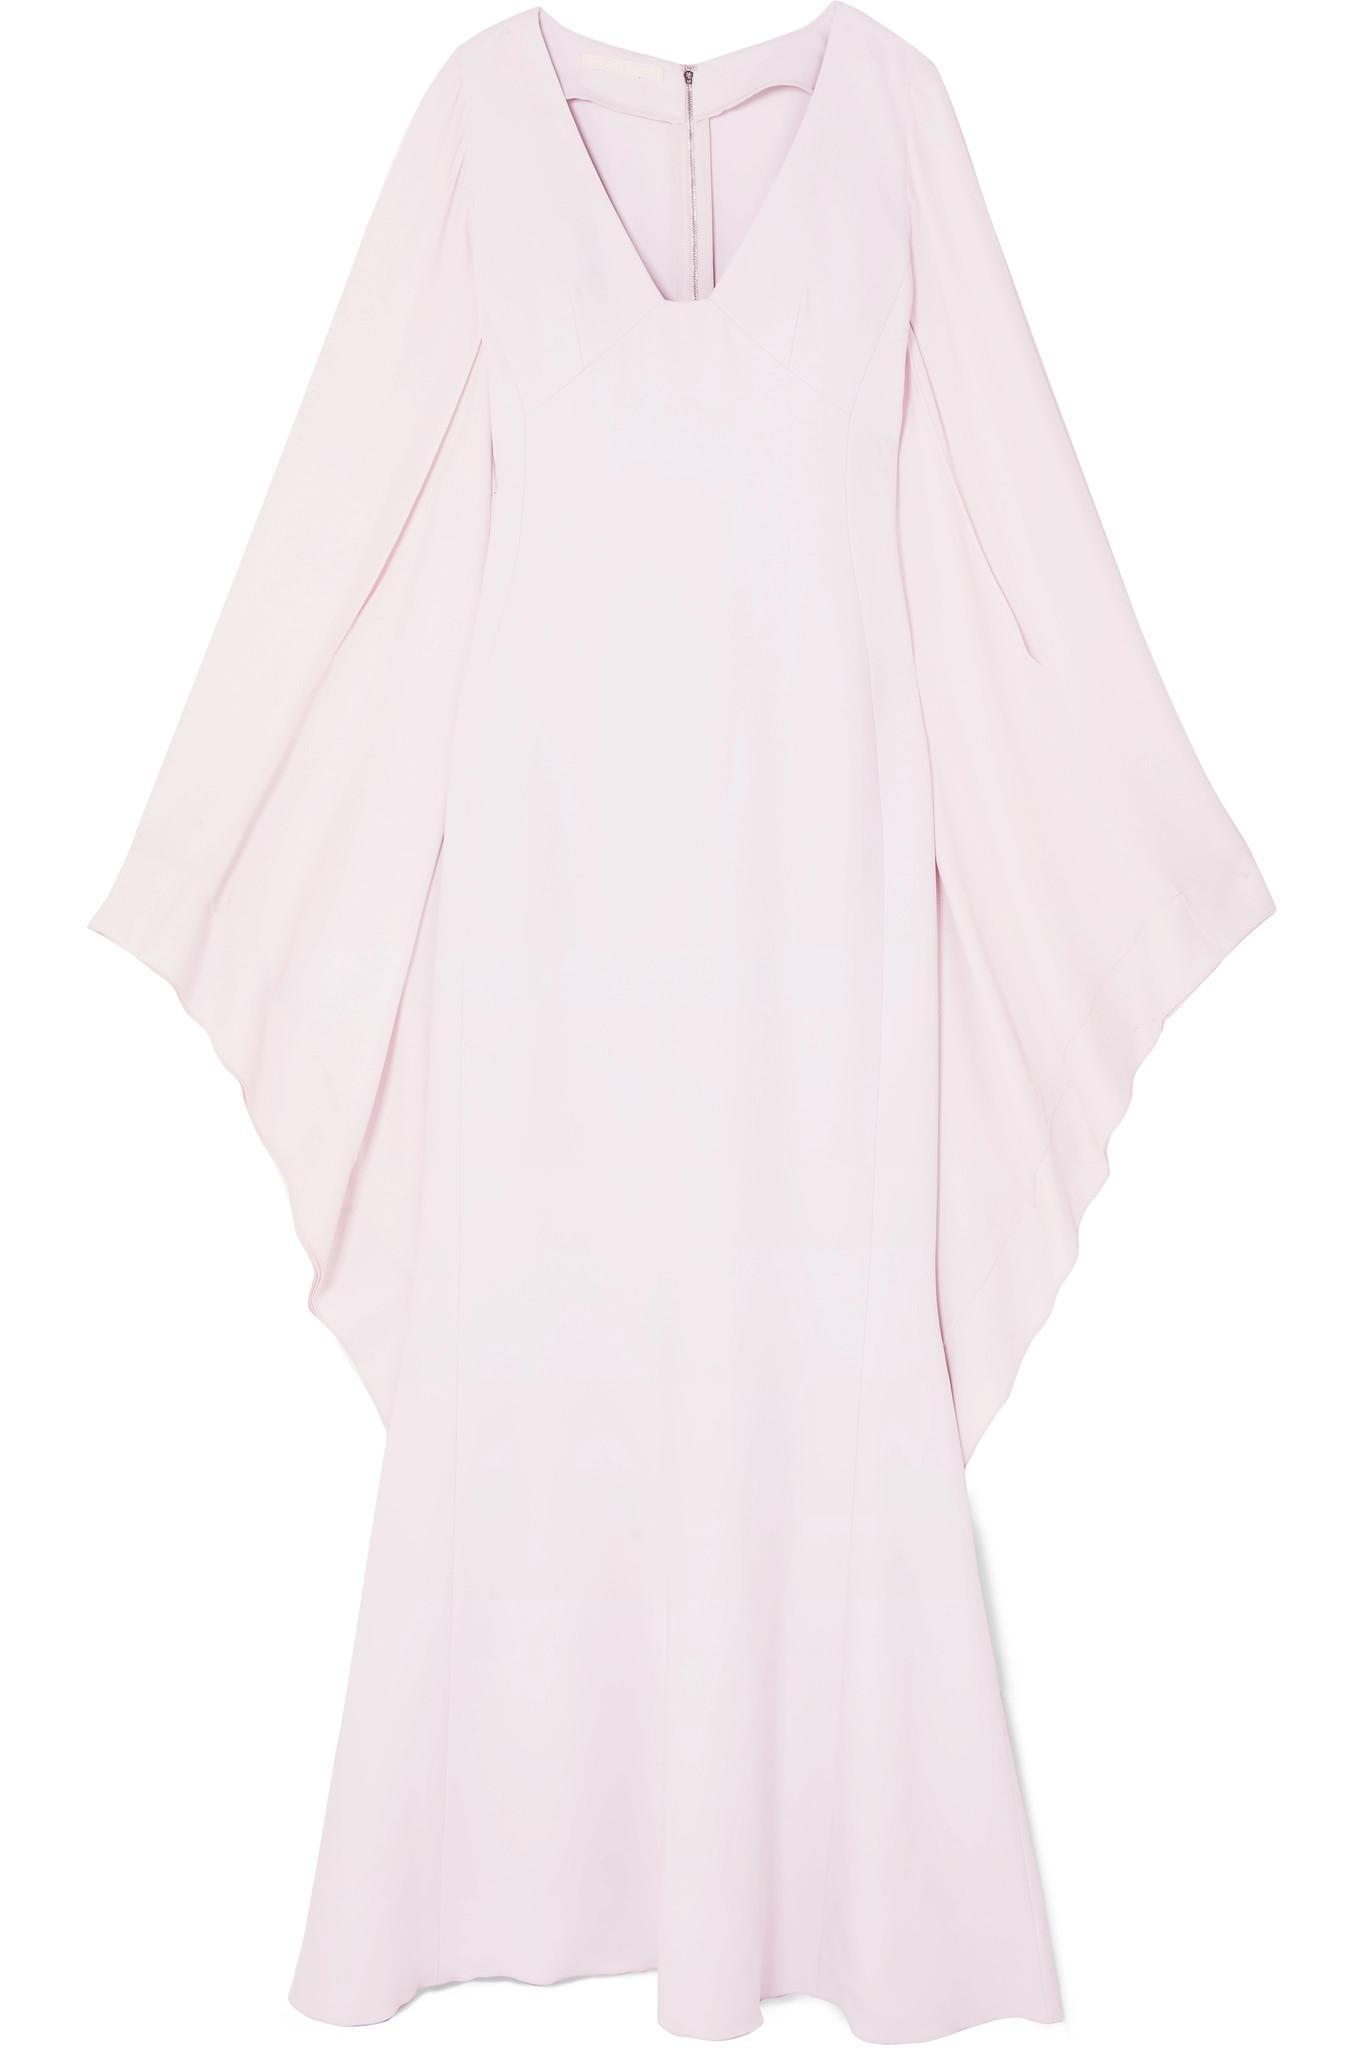 Antonio Berardi. Women's Pink Draped Crepe And Georgette Gown